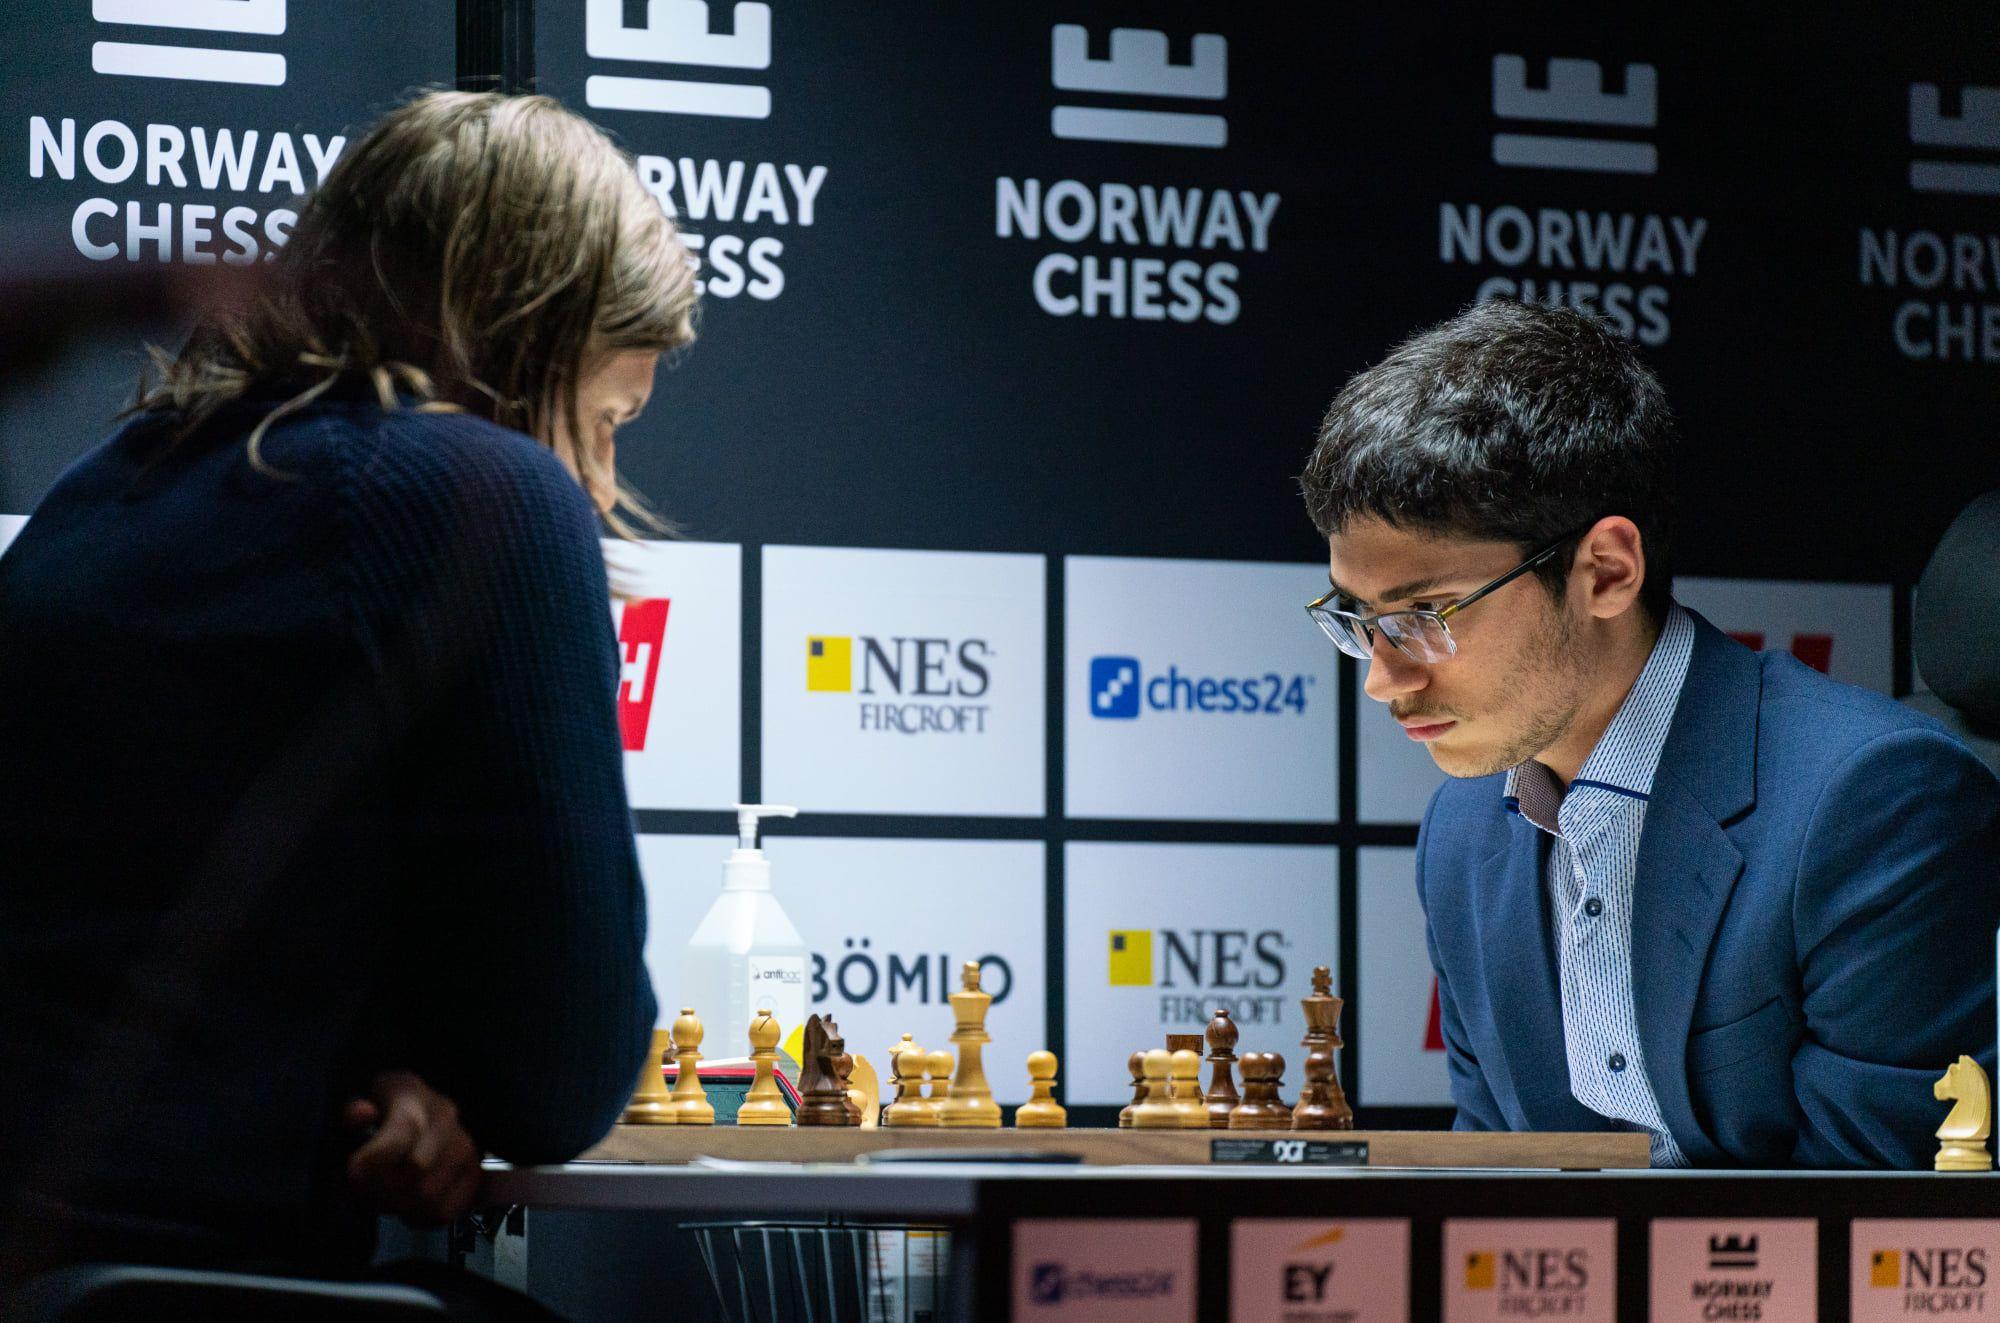 Rapport Firouzja Norway Chess 2021